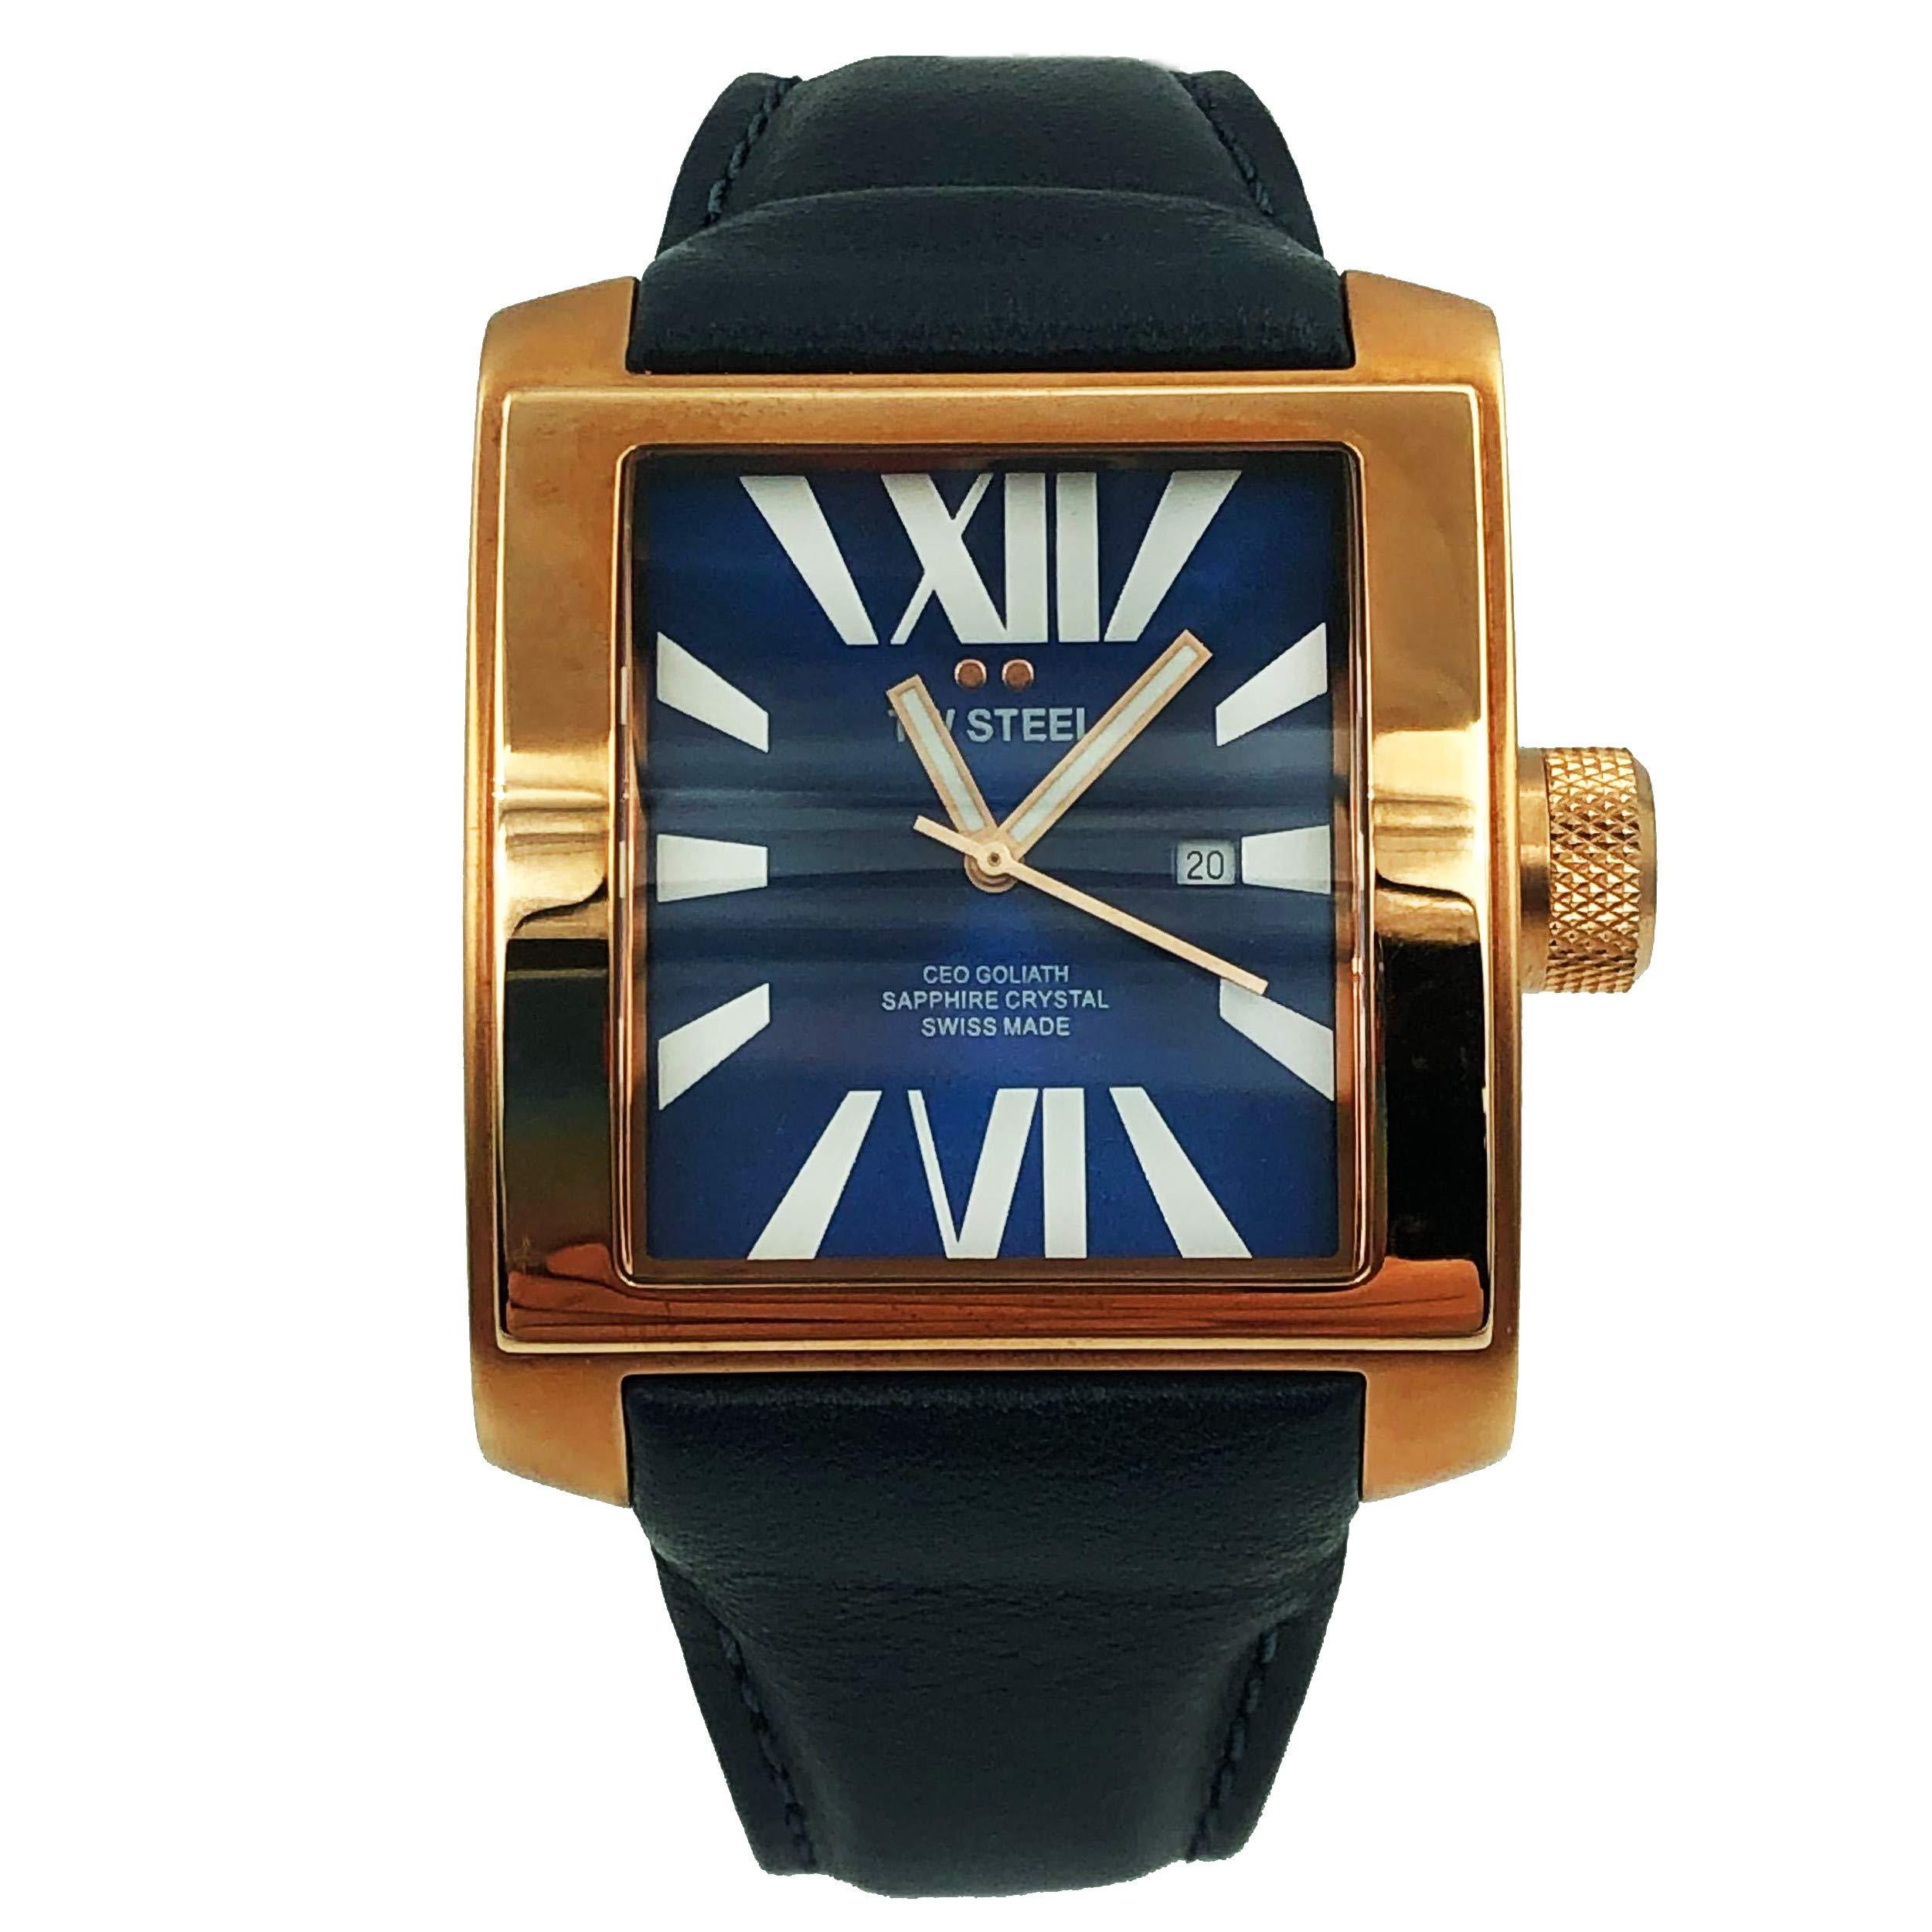 TW Steel CEO Quartz Male Watch CE3017 (Certified Pre-Owned)